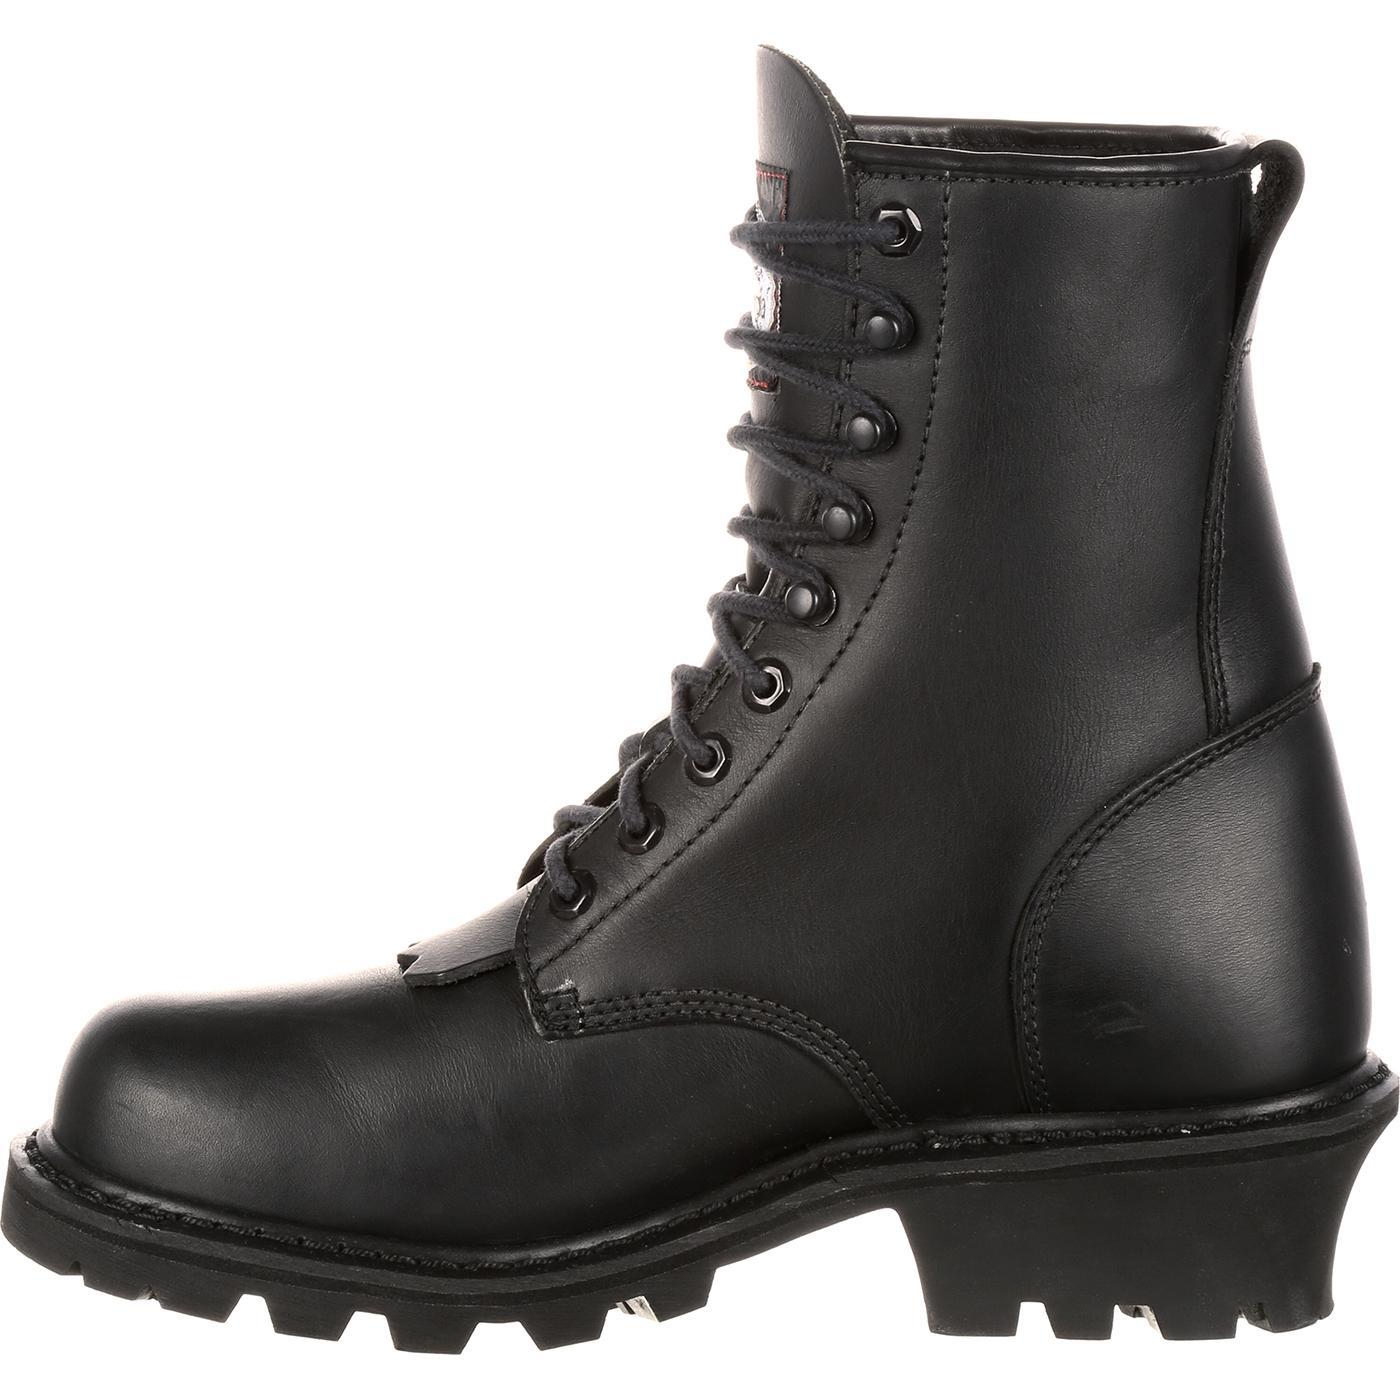 b232cd71ac4 Georgia Boot Black 8-in Logger Work Boot